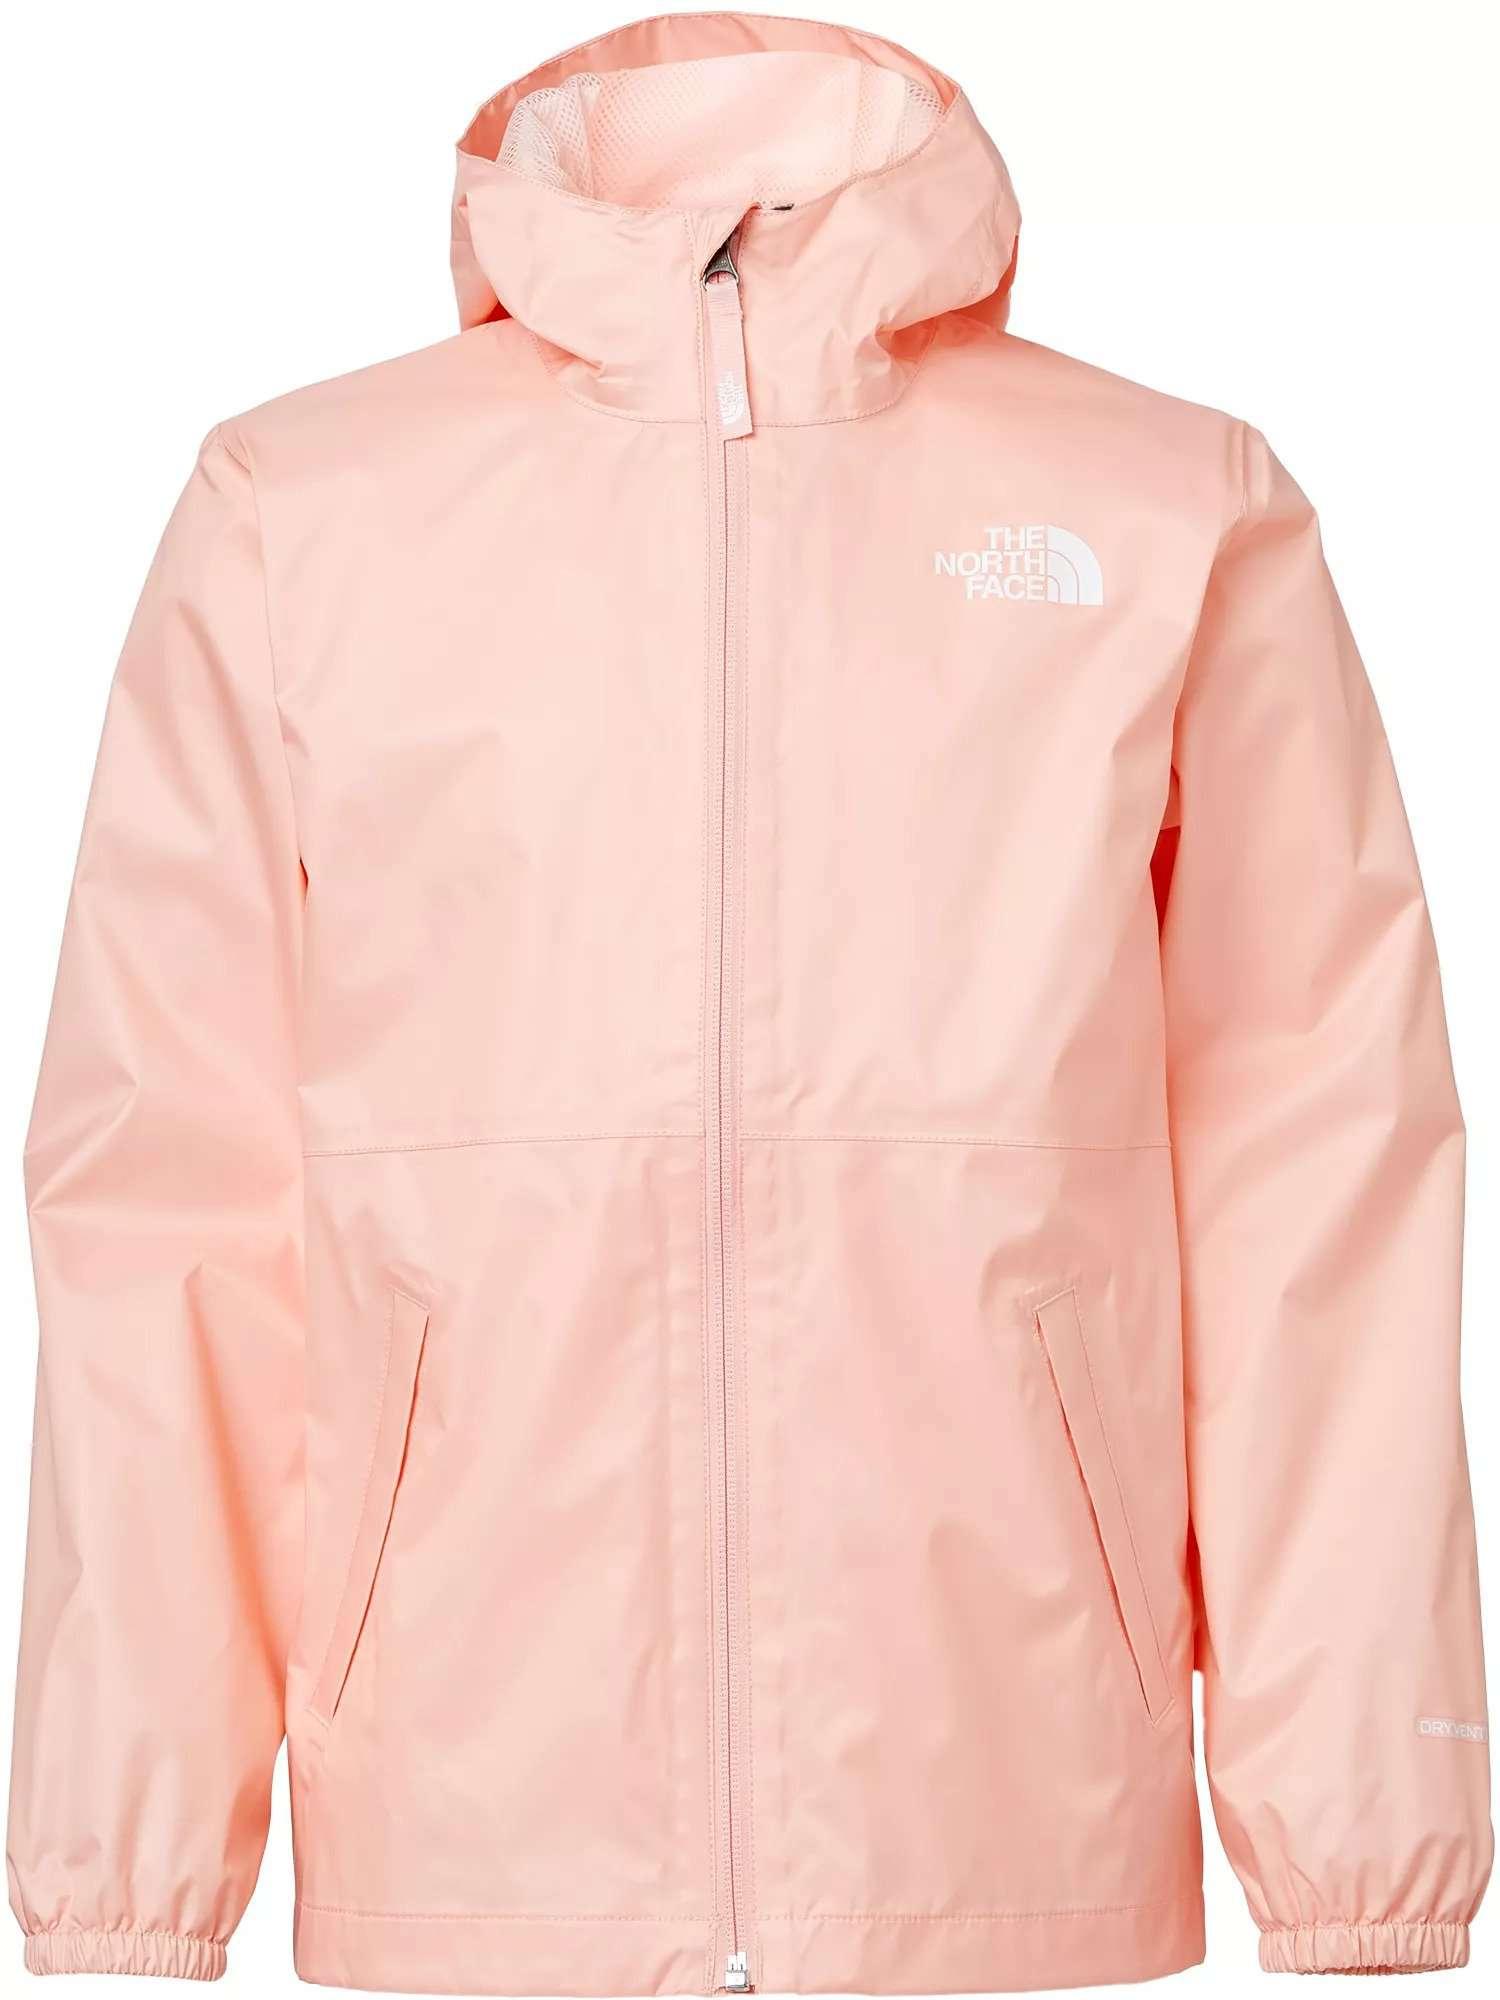 The North Face Girls' Zipline Rain Jacket